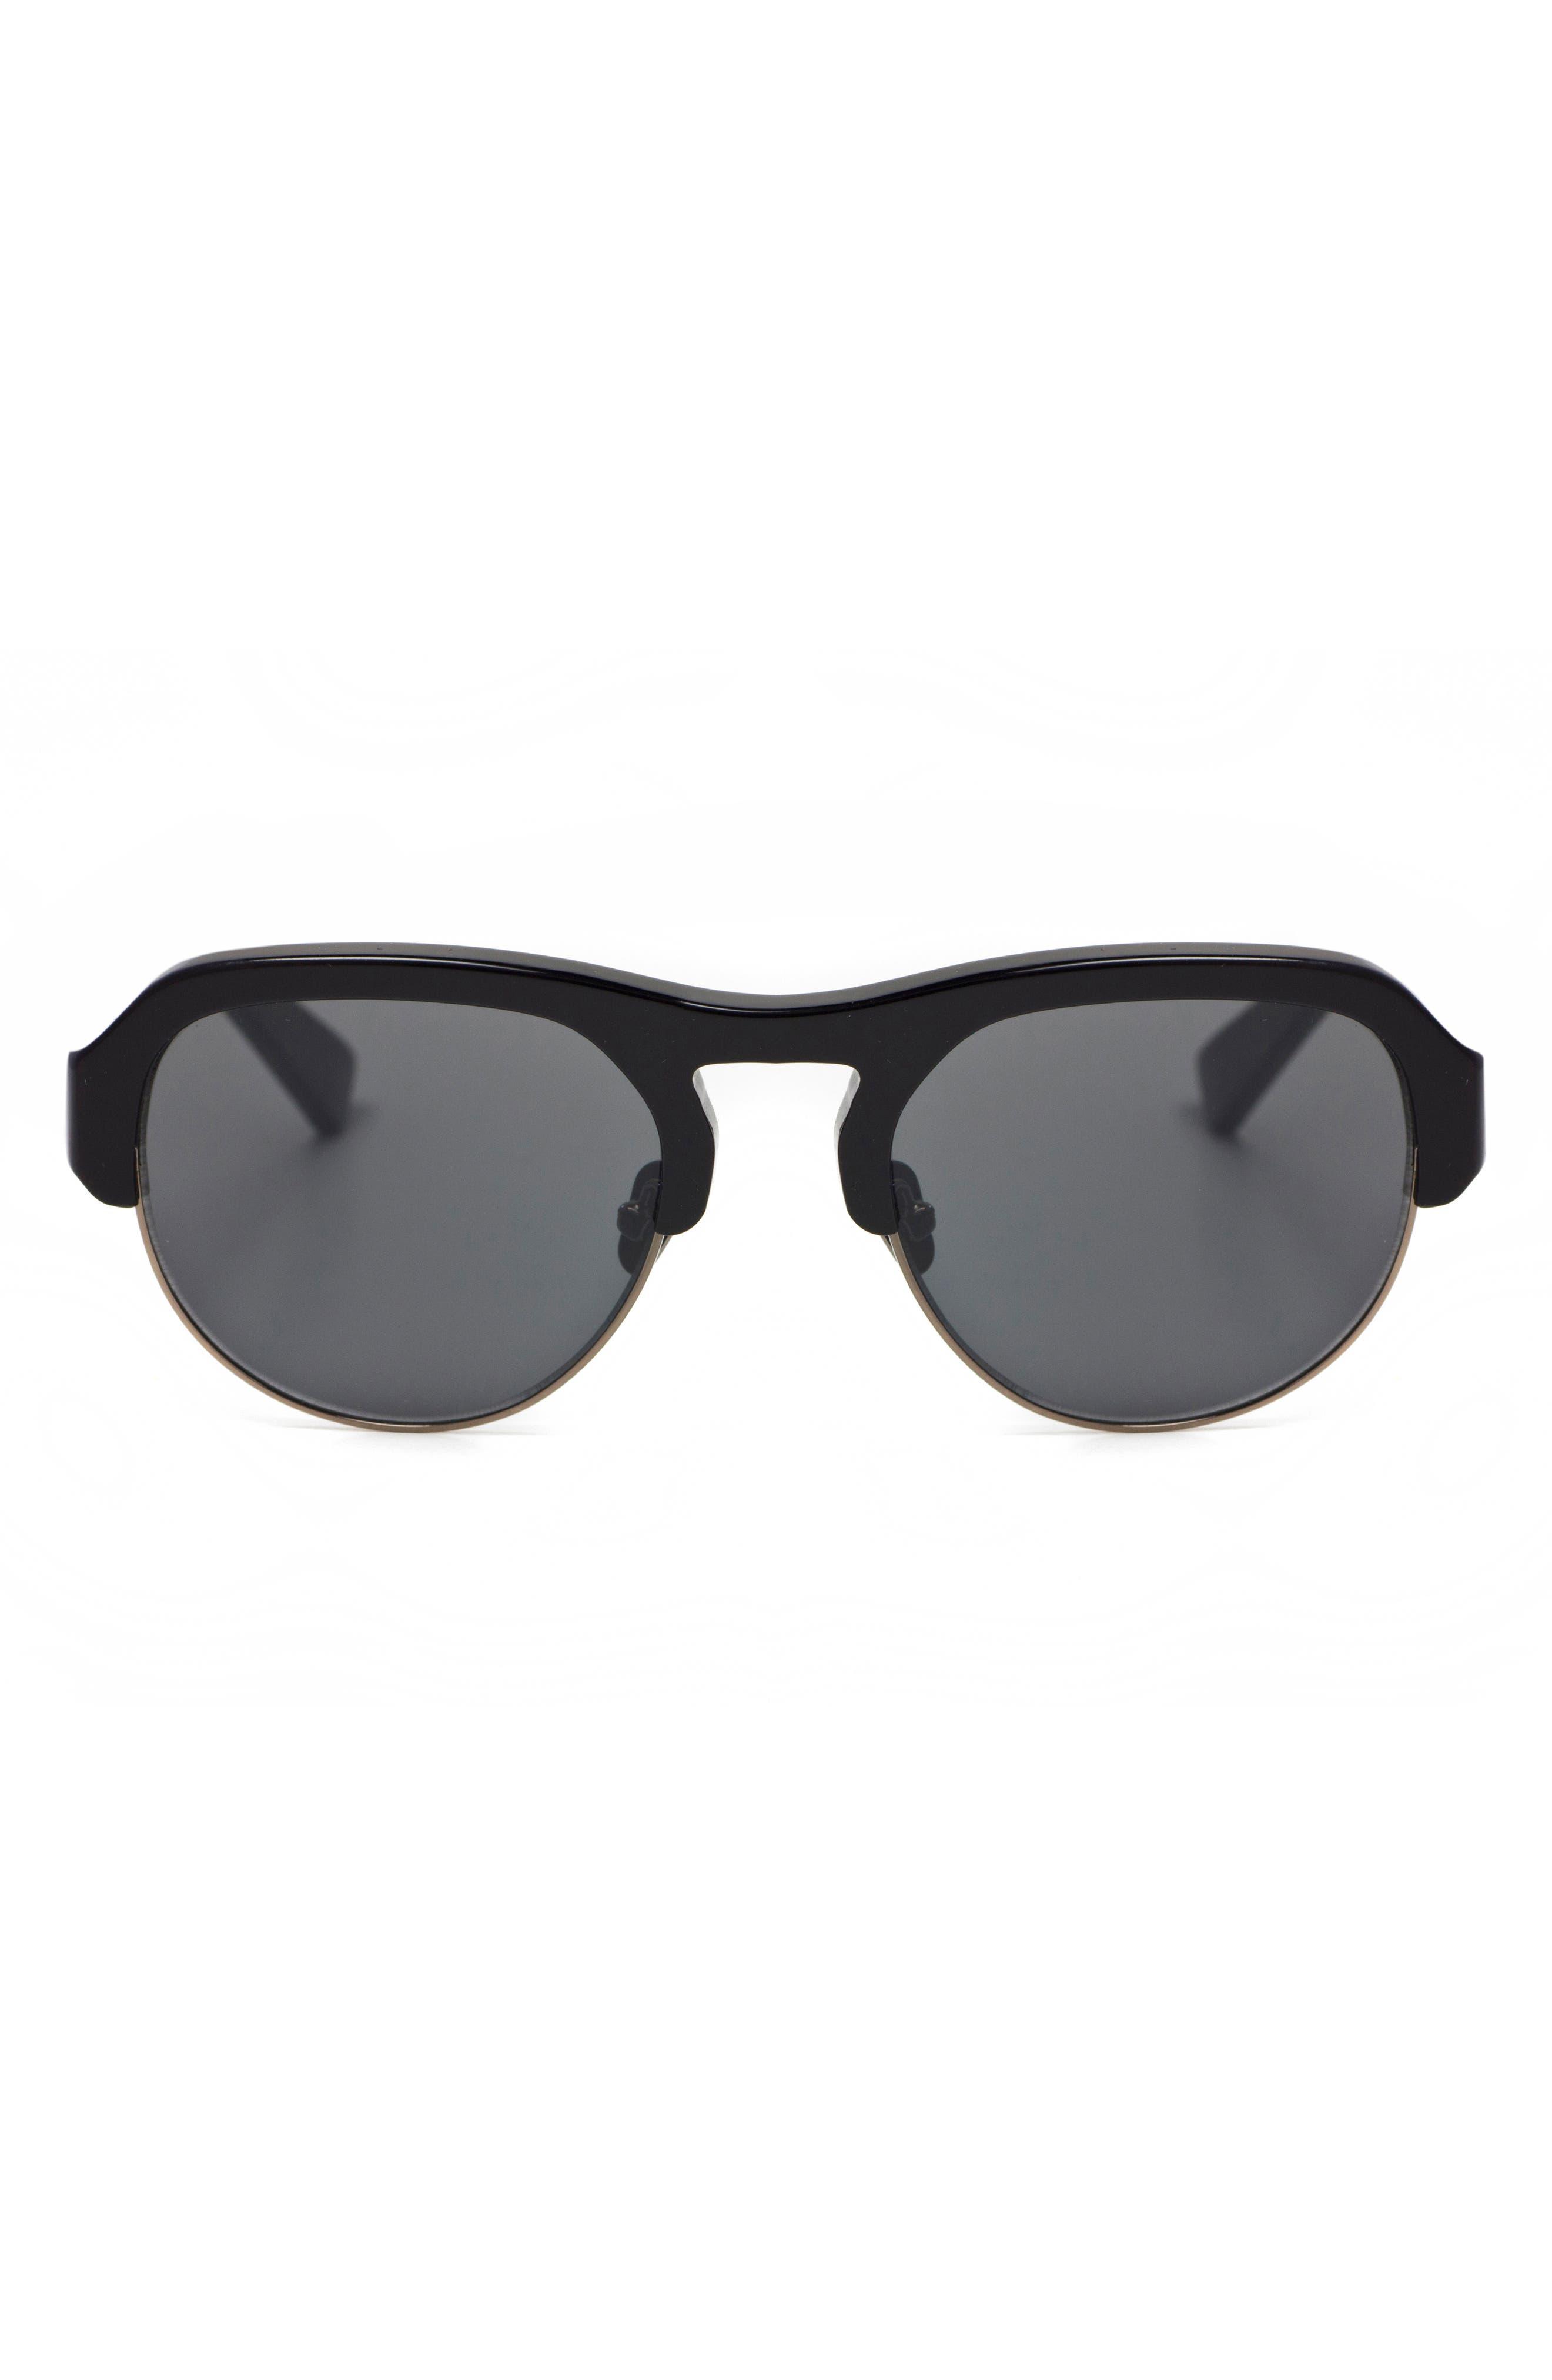 Nomad 52mm Sunglasses,                             Alternate thumbnail 3, color,                             Black/ Gunmetal